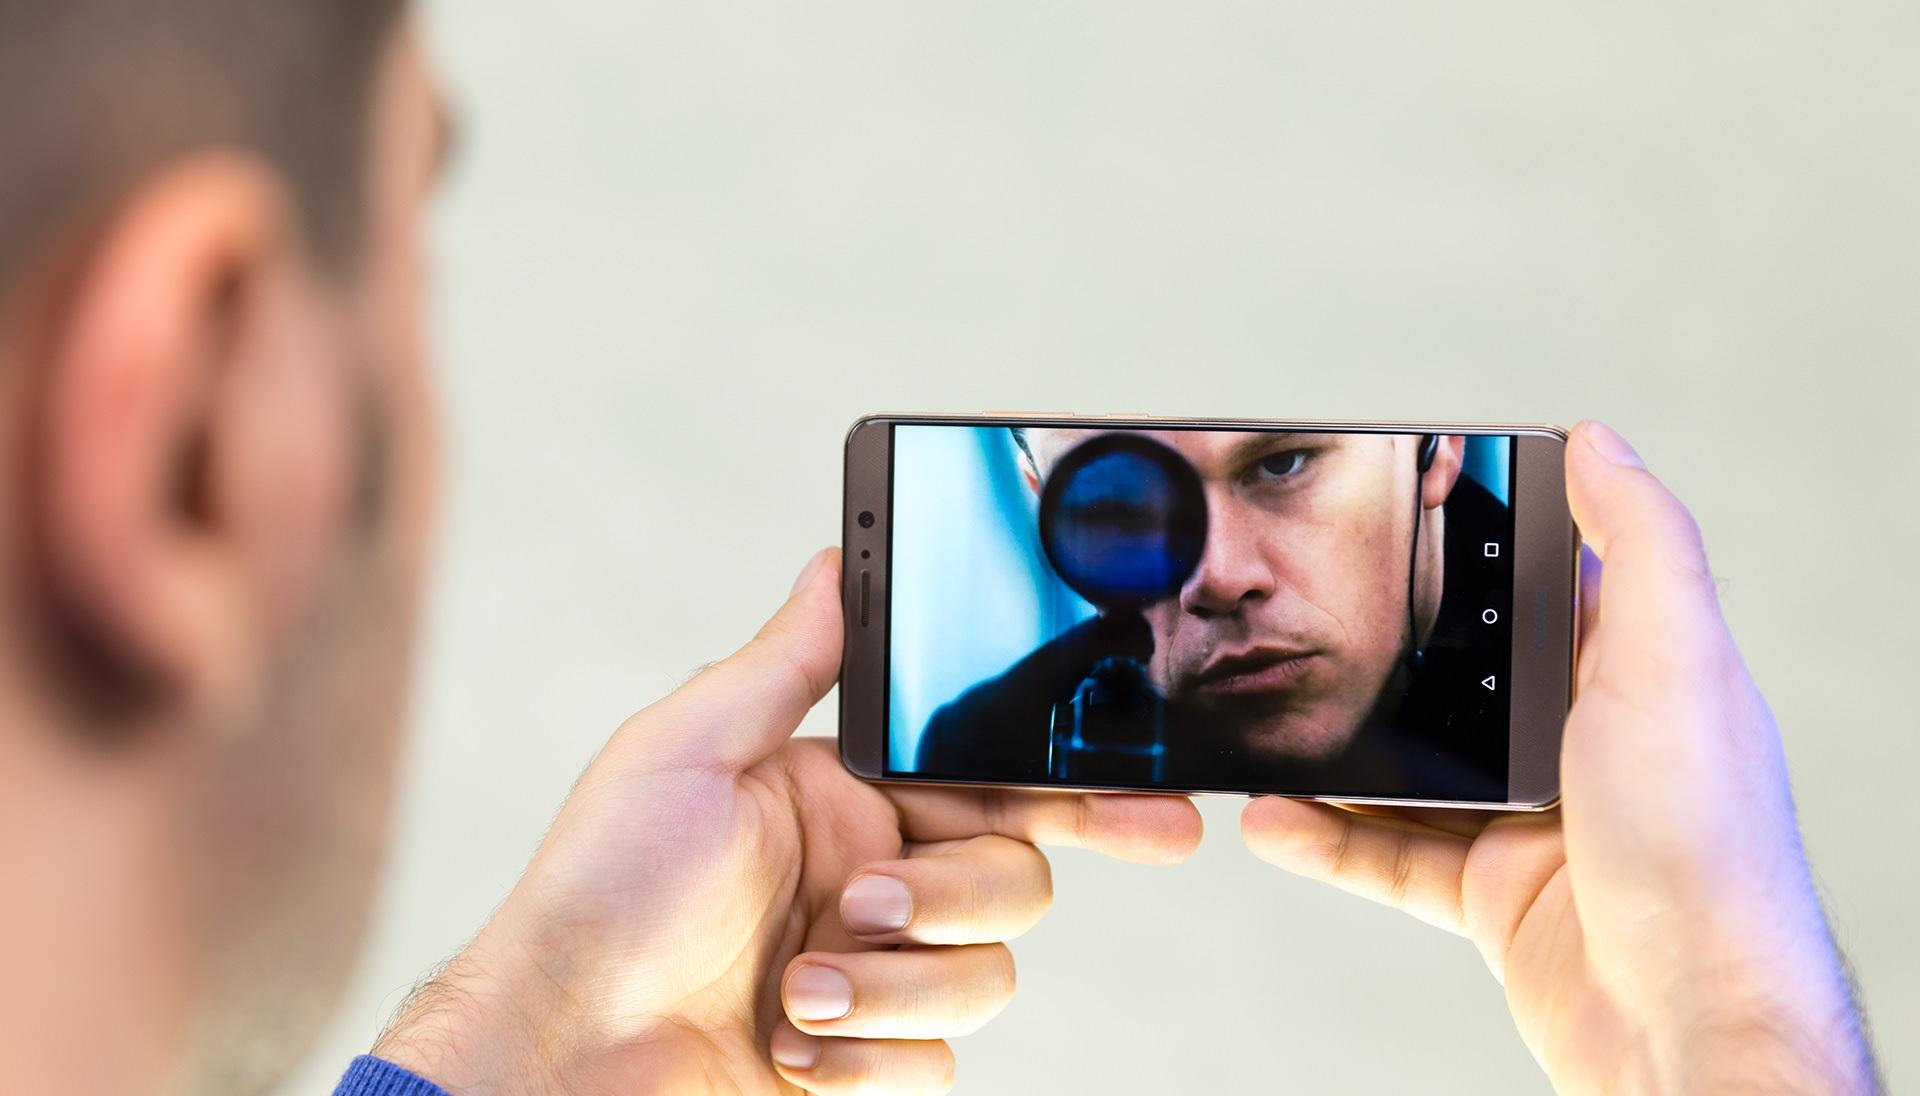 phone-review-huawei-mate-9-2